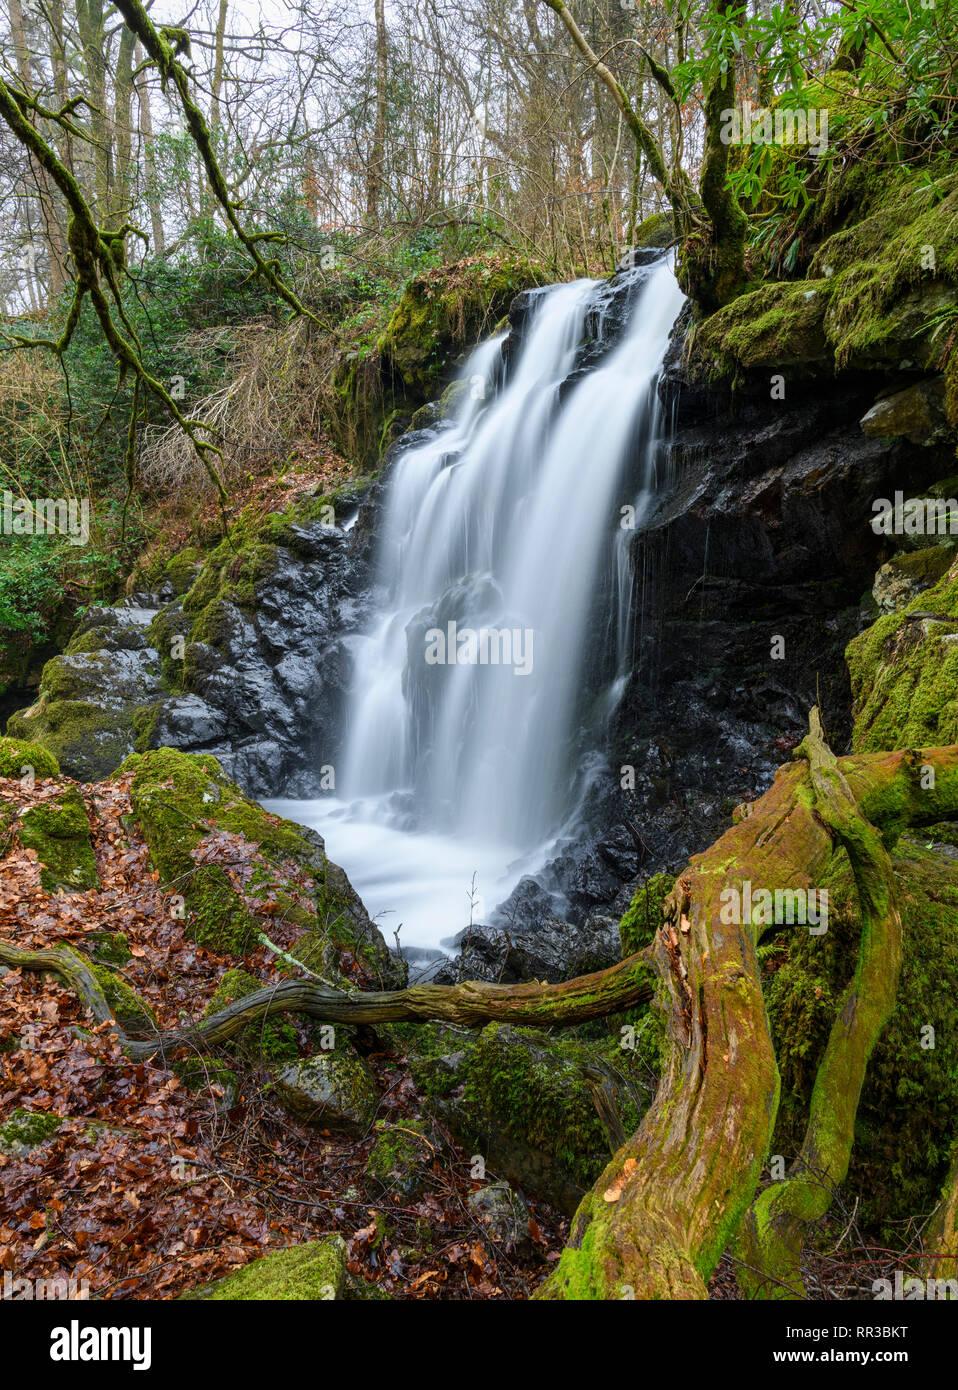 Bucks Linn waterfall, near Glenlee, Dumfries & Galloway, Scotland - Stock Image